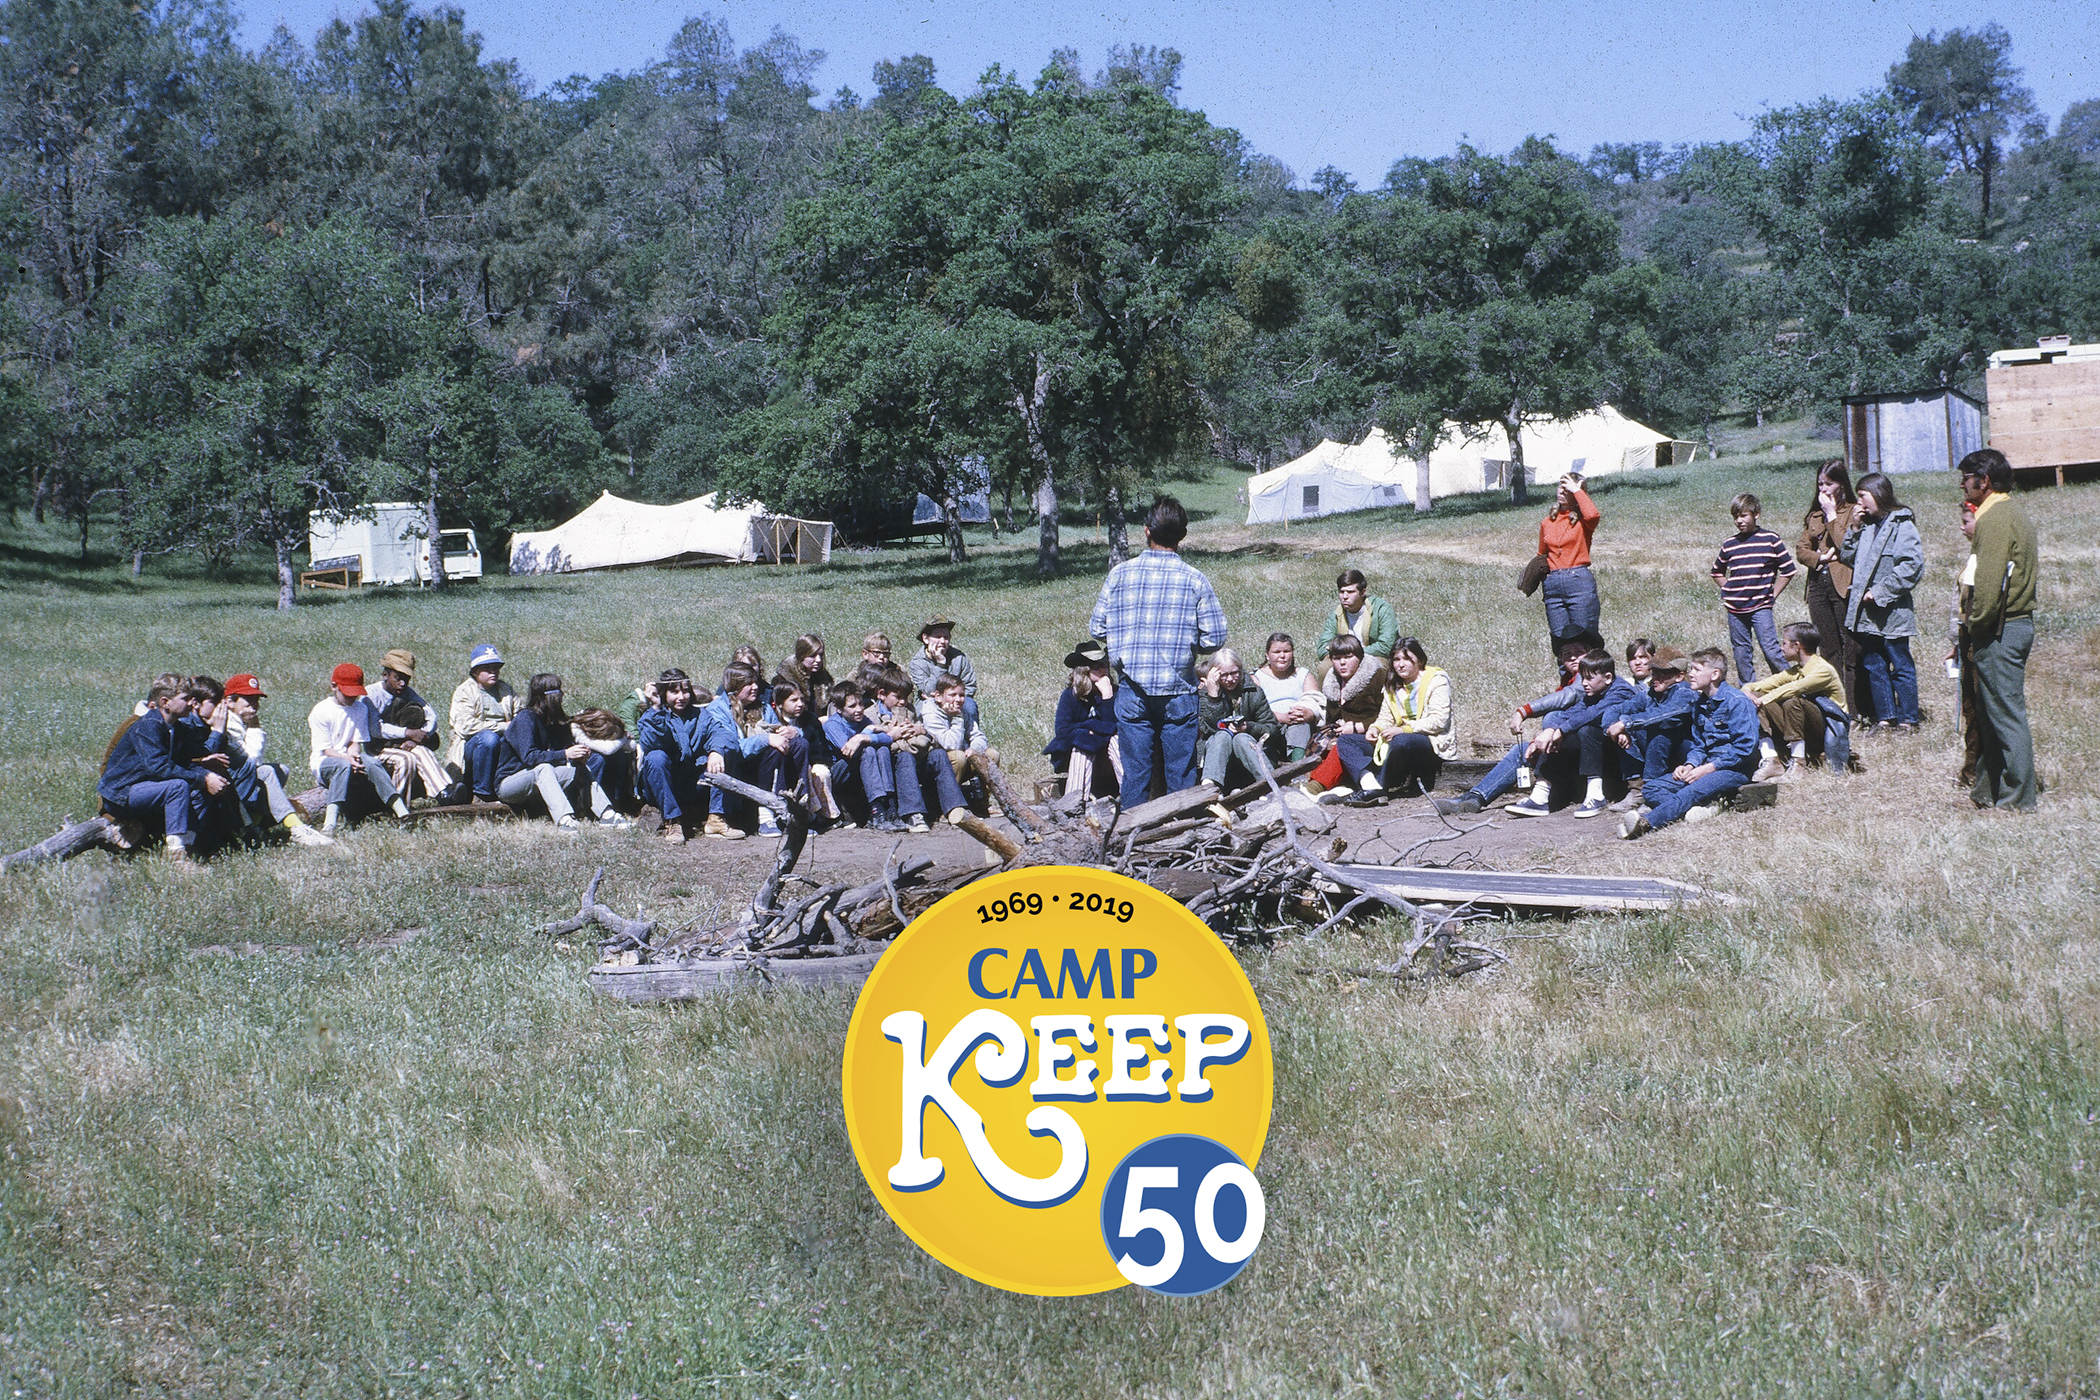 Camp KEEP Celebrates 50 Years